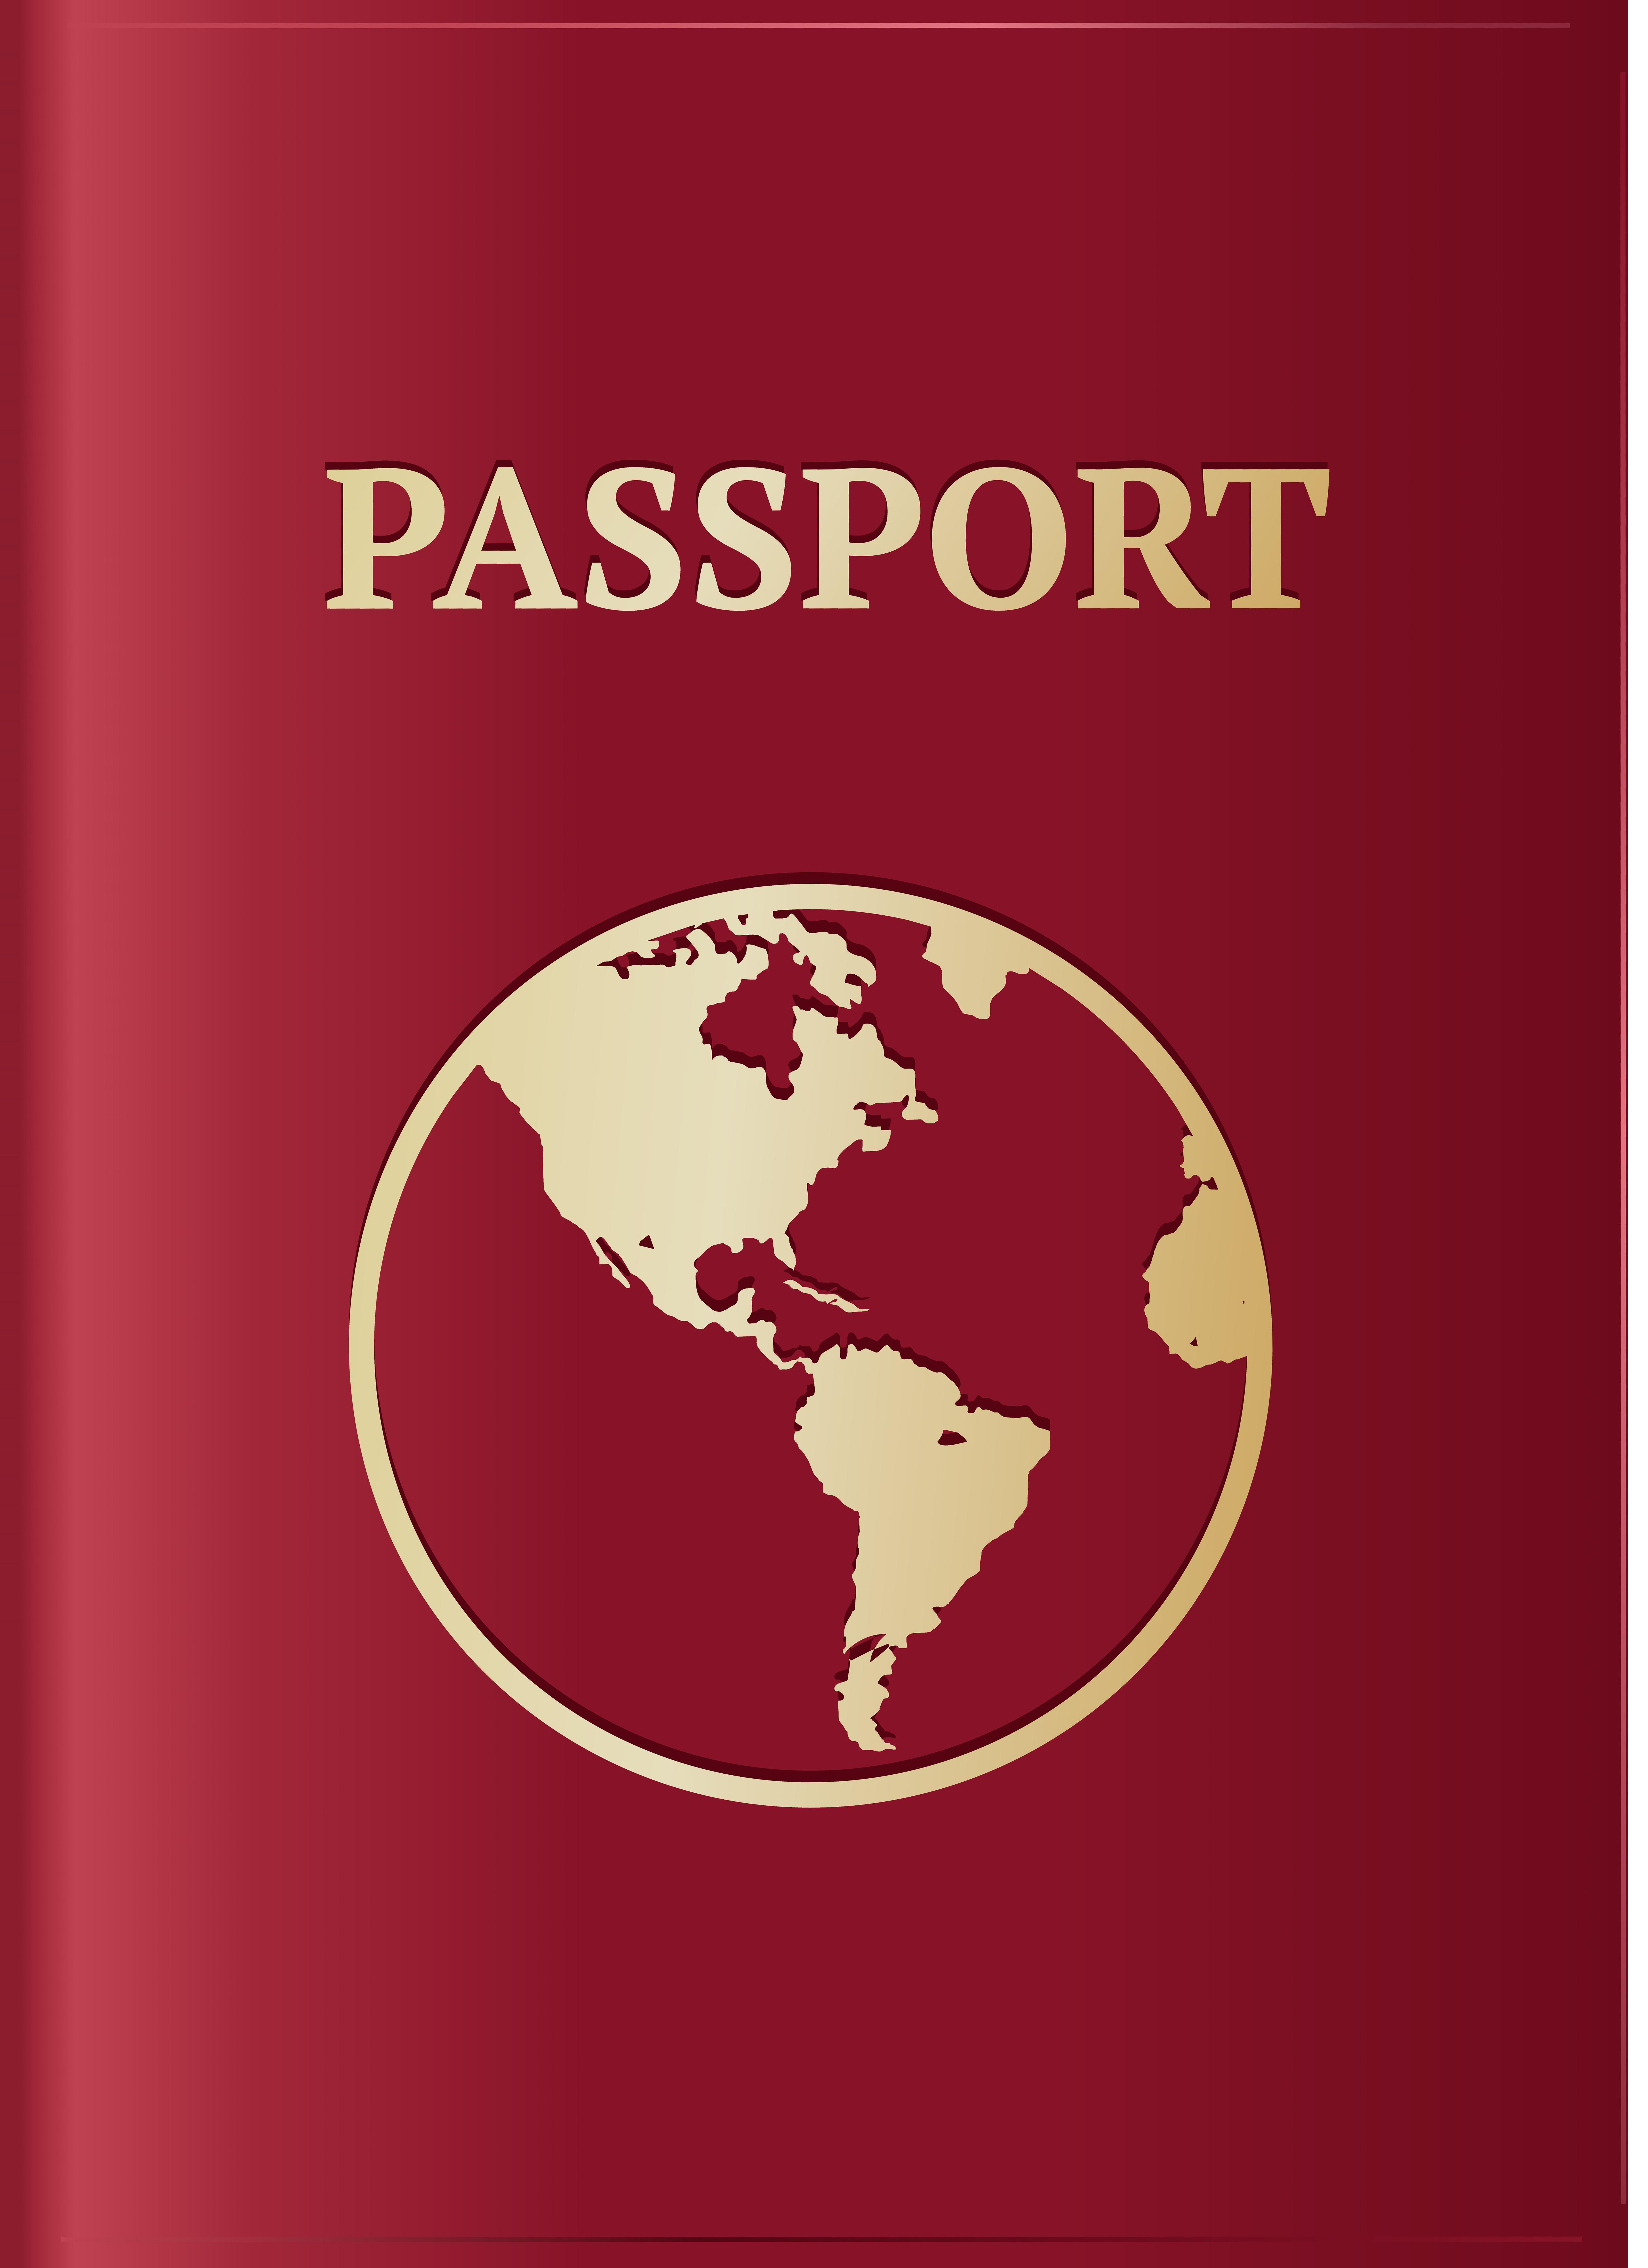 Passport clipart passport book. Red transparent png image